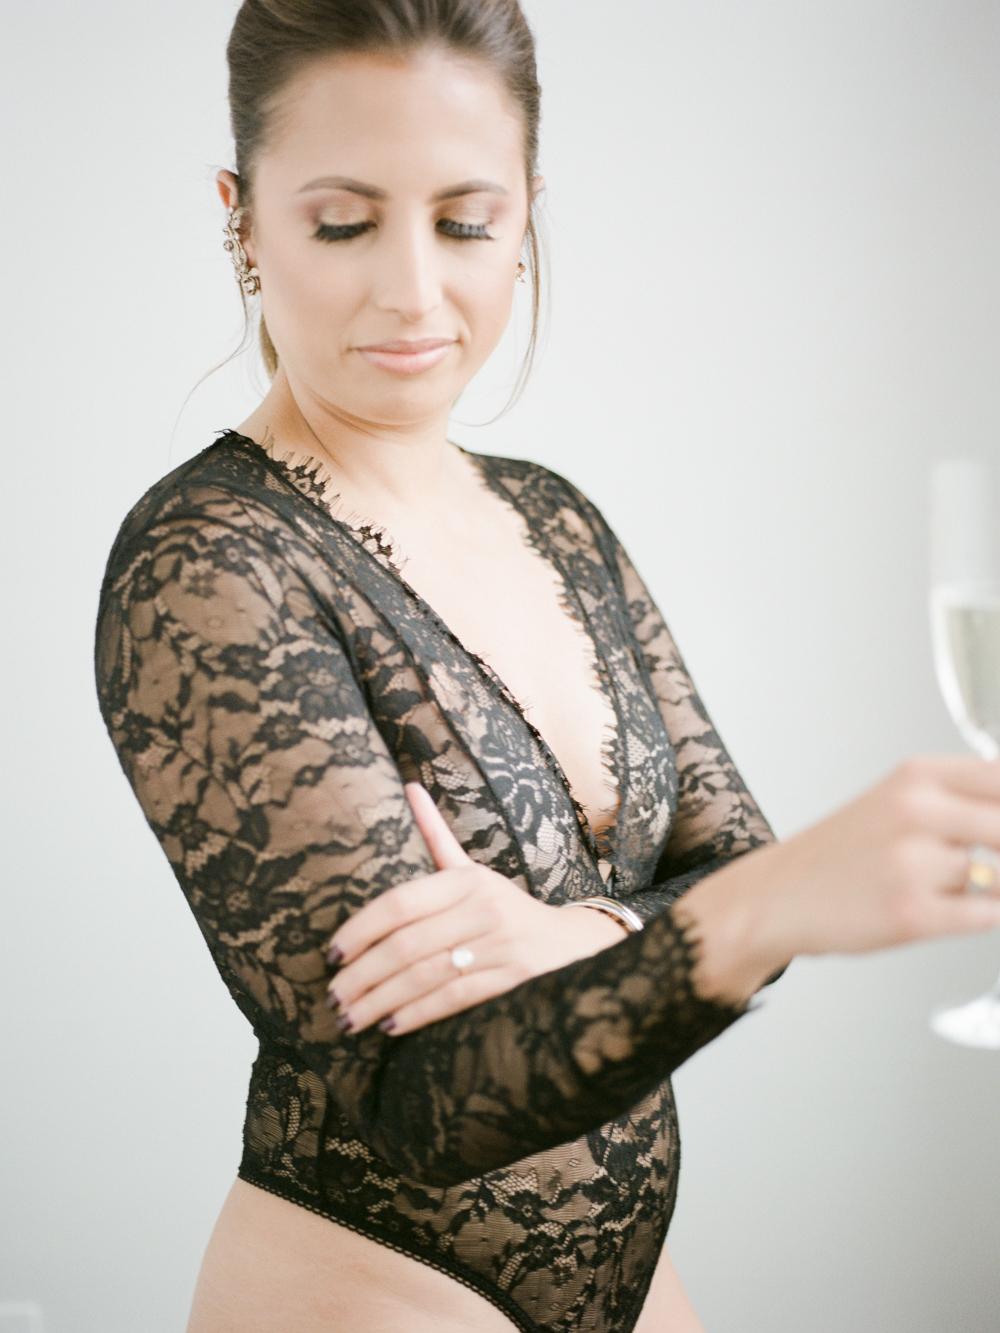 Christine-Gosch-Houston-boudoir-photographer-film-photography-fill-in-the-blank-wedding-photographer-2.jpg